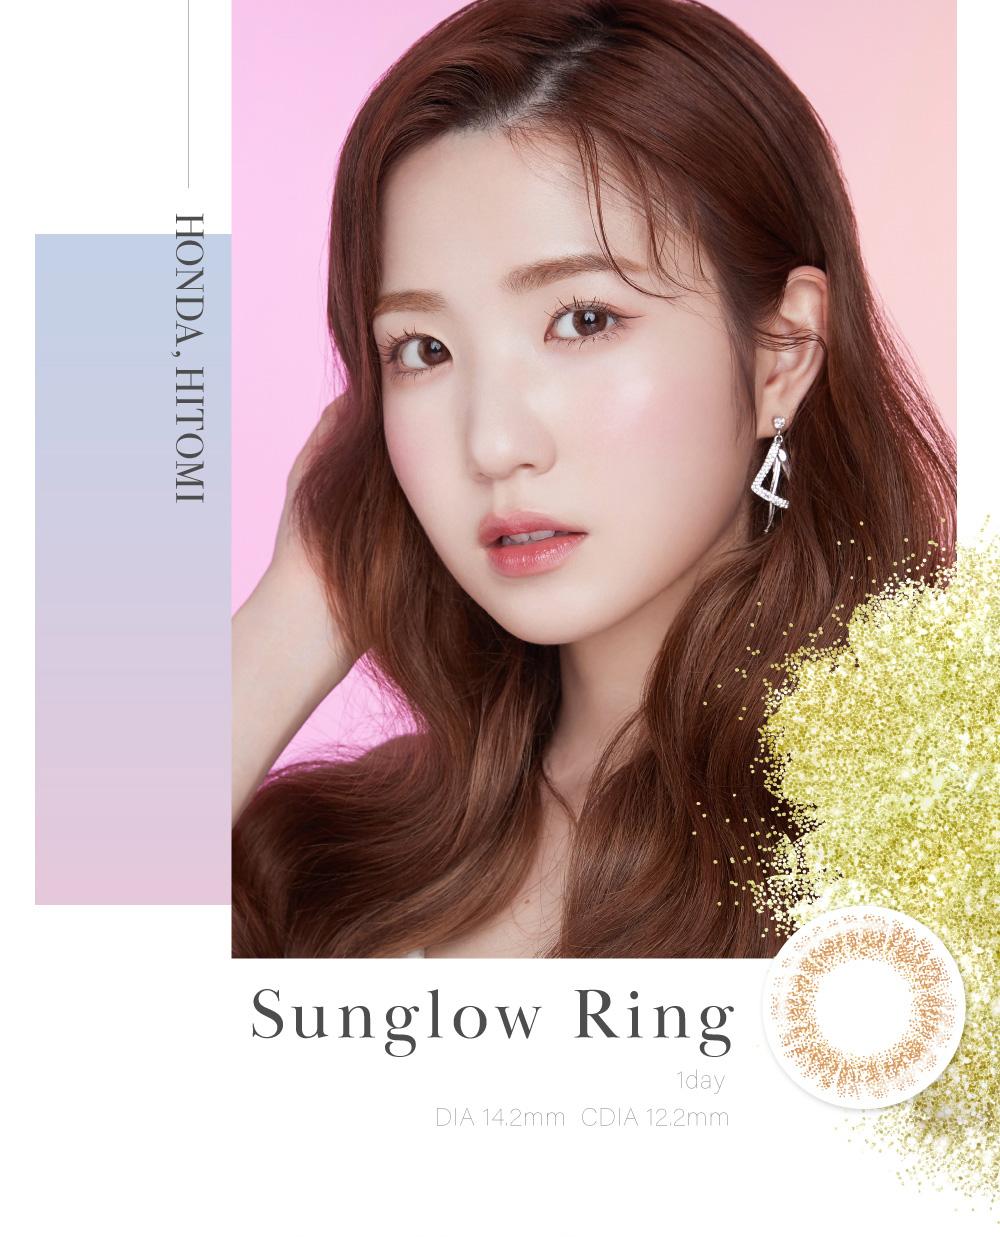 【Sunglow Ringサングローリング】Miche Bloomin' 1Day Iris Grow Series ミッシュブルーミンワンデーアイリスグローシリーズ